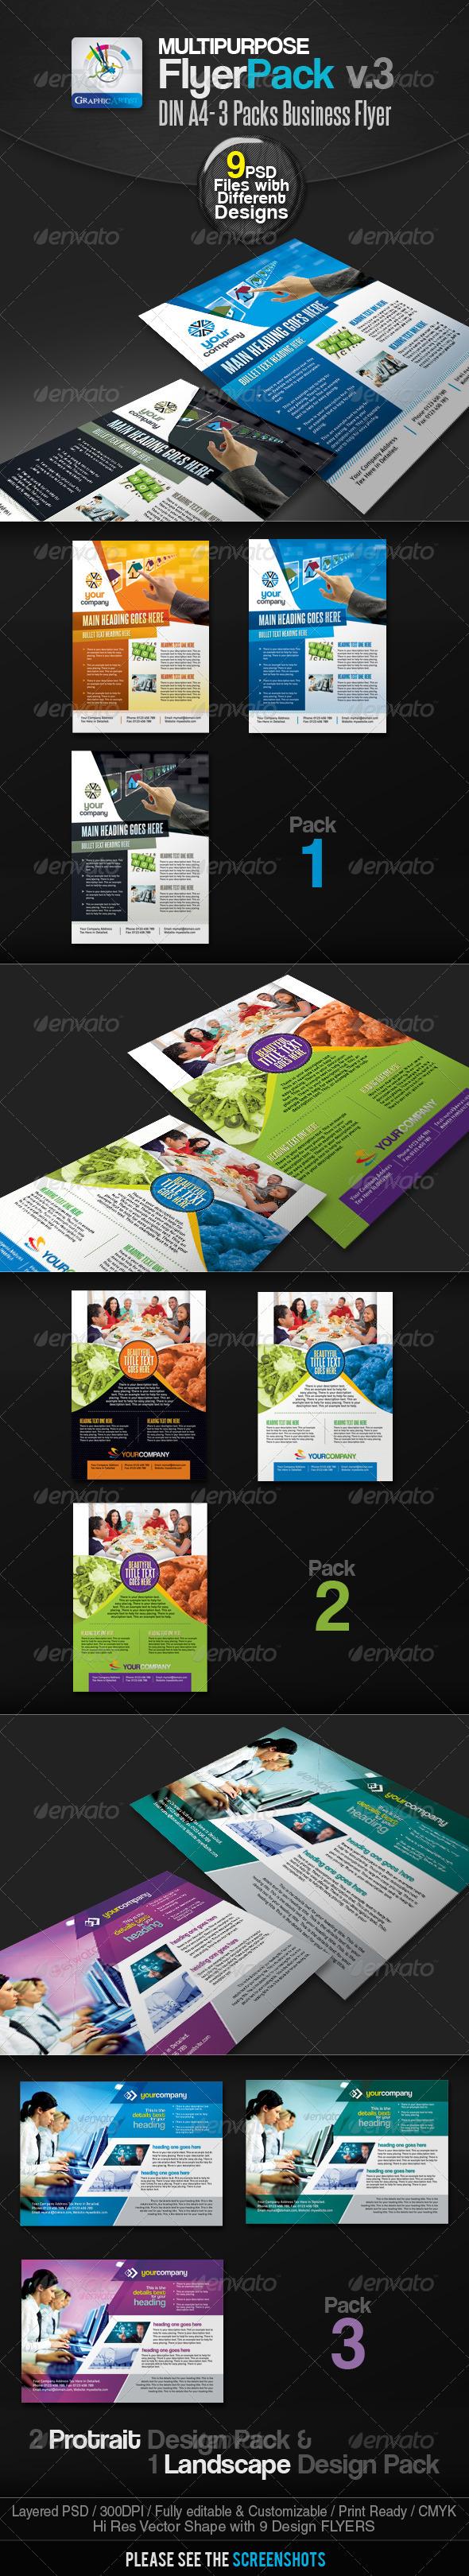 Multipurpose Business Flyer Pack v.3 - Corporate Flyers